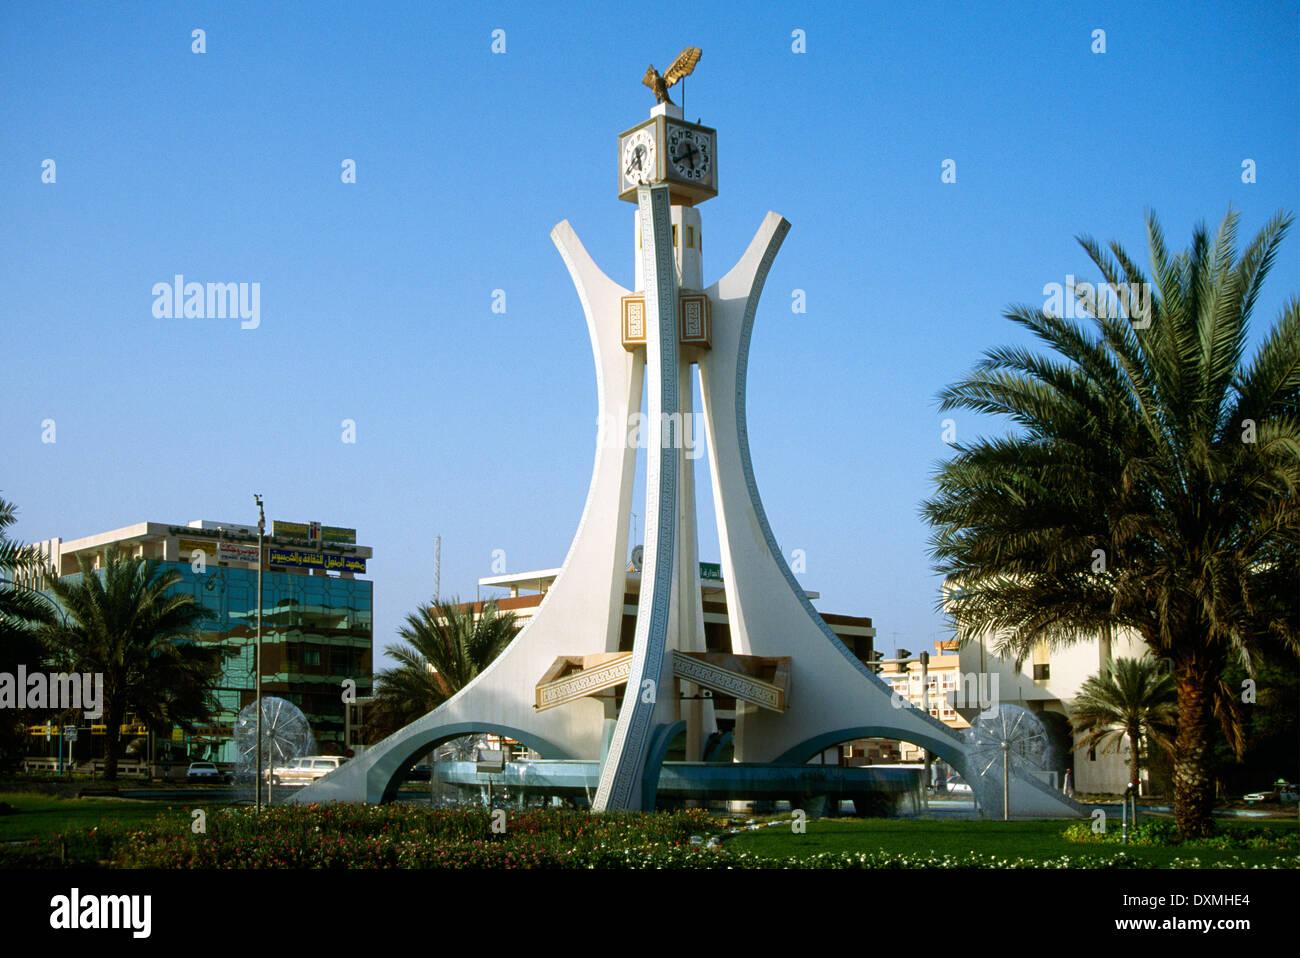 Abu dhabi uae al ain 1994 clock tower roundabout stock for Diwan roundabout al ain